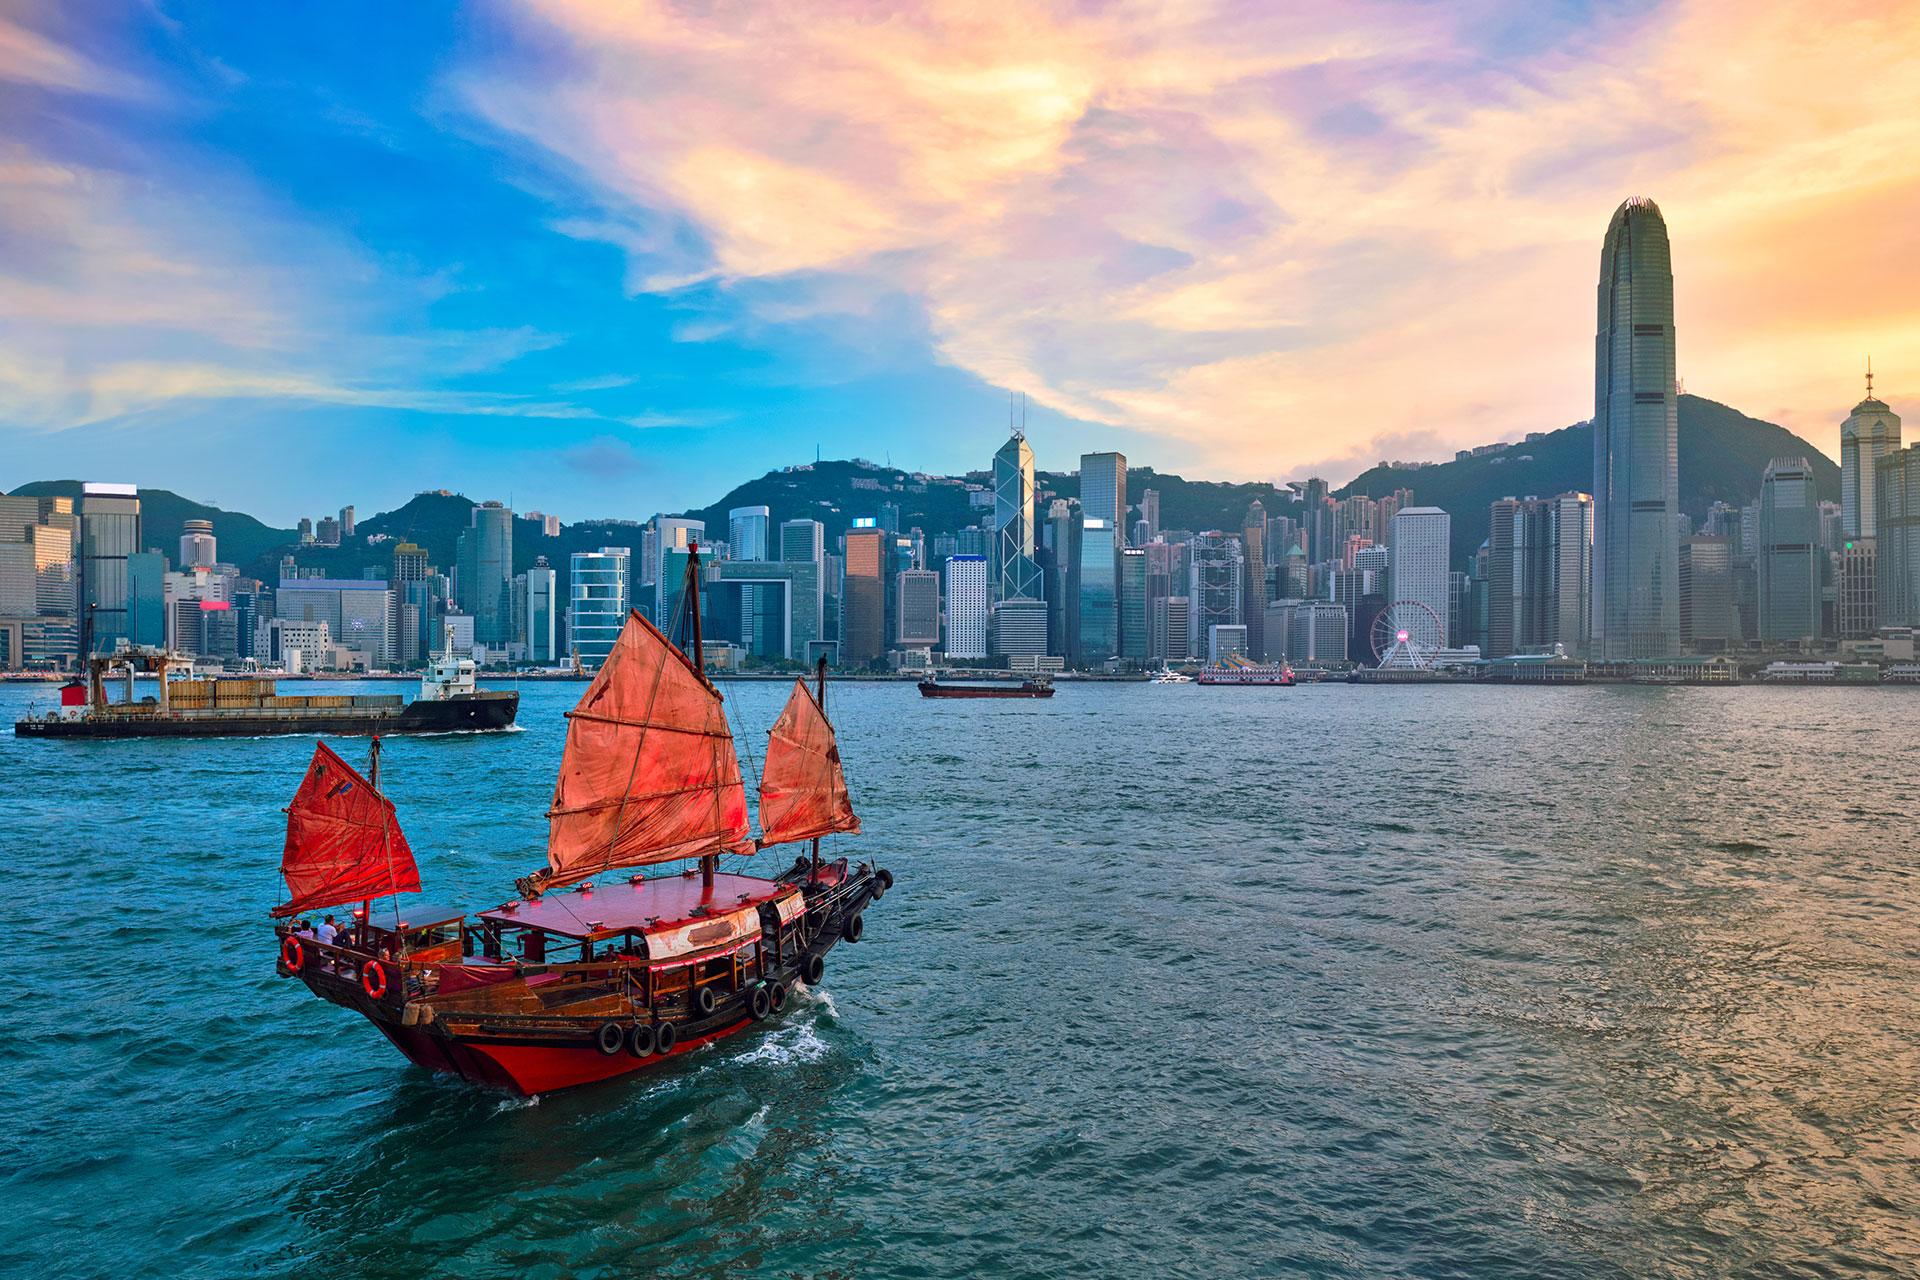 Hong Kong: Fragnant Harbor